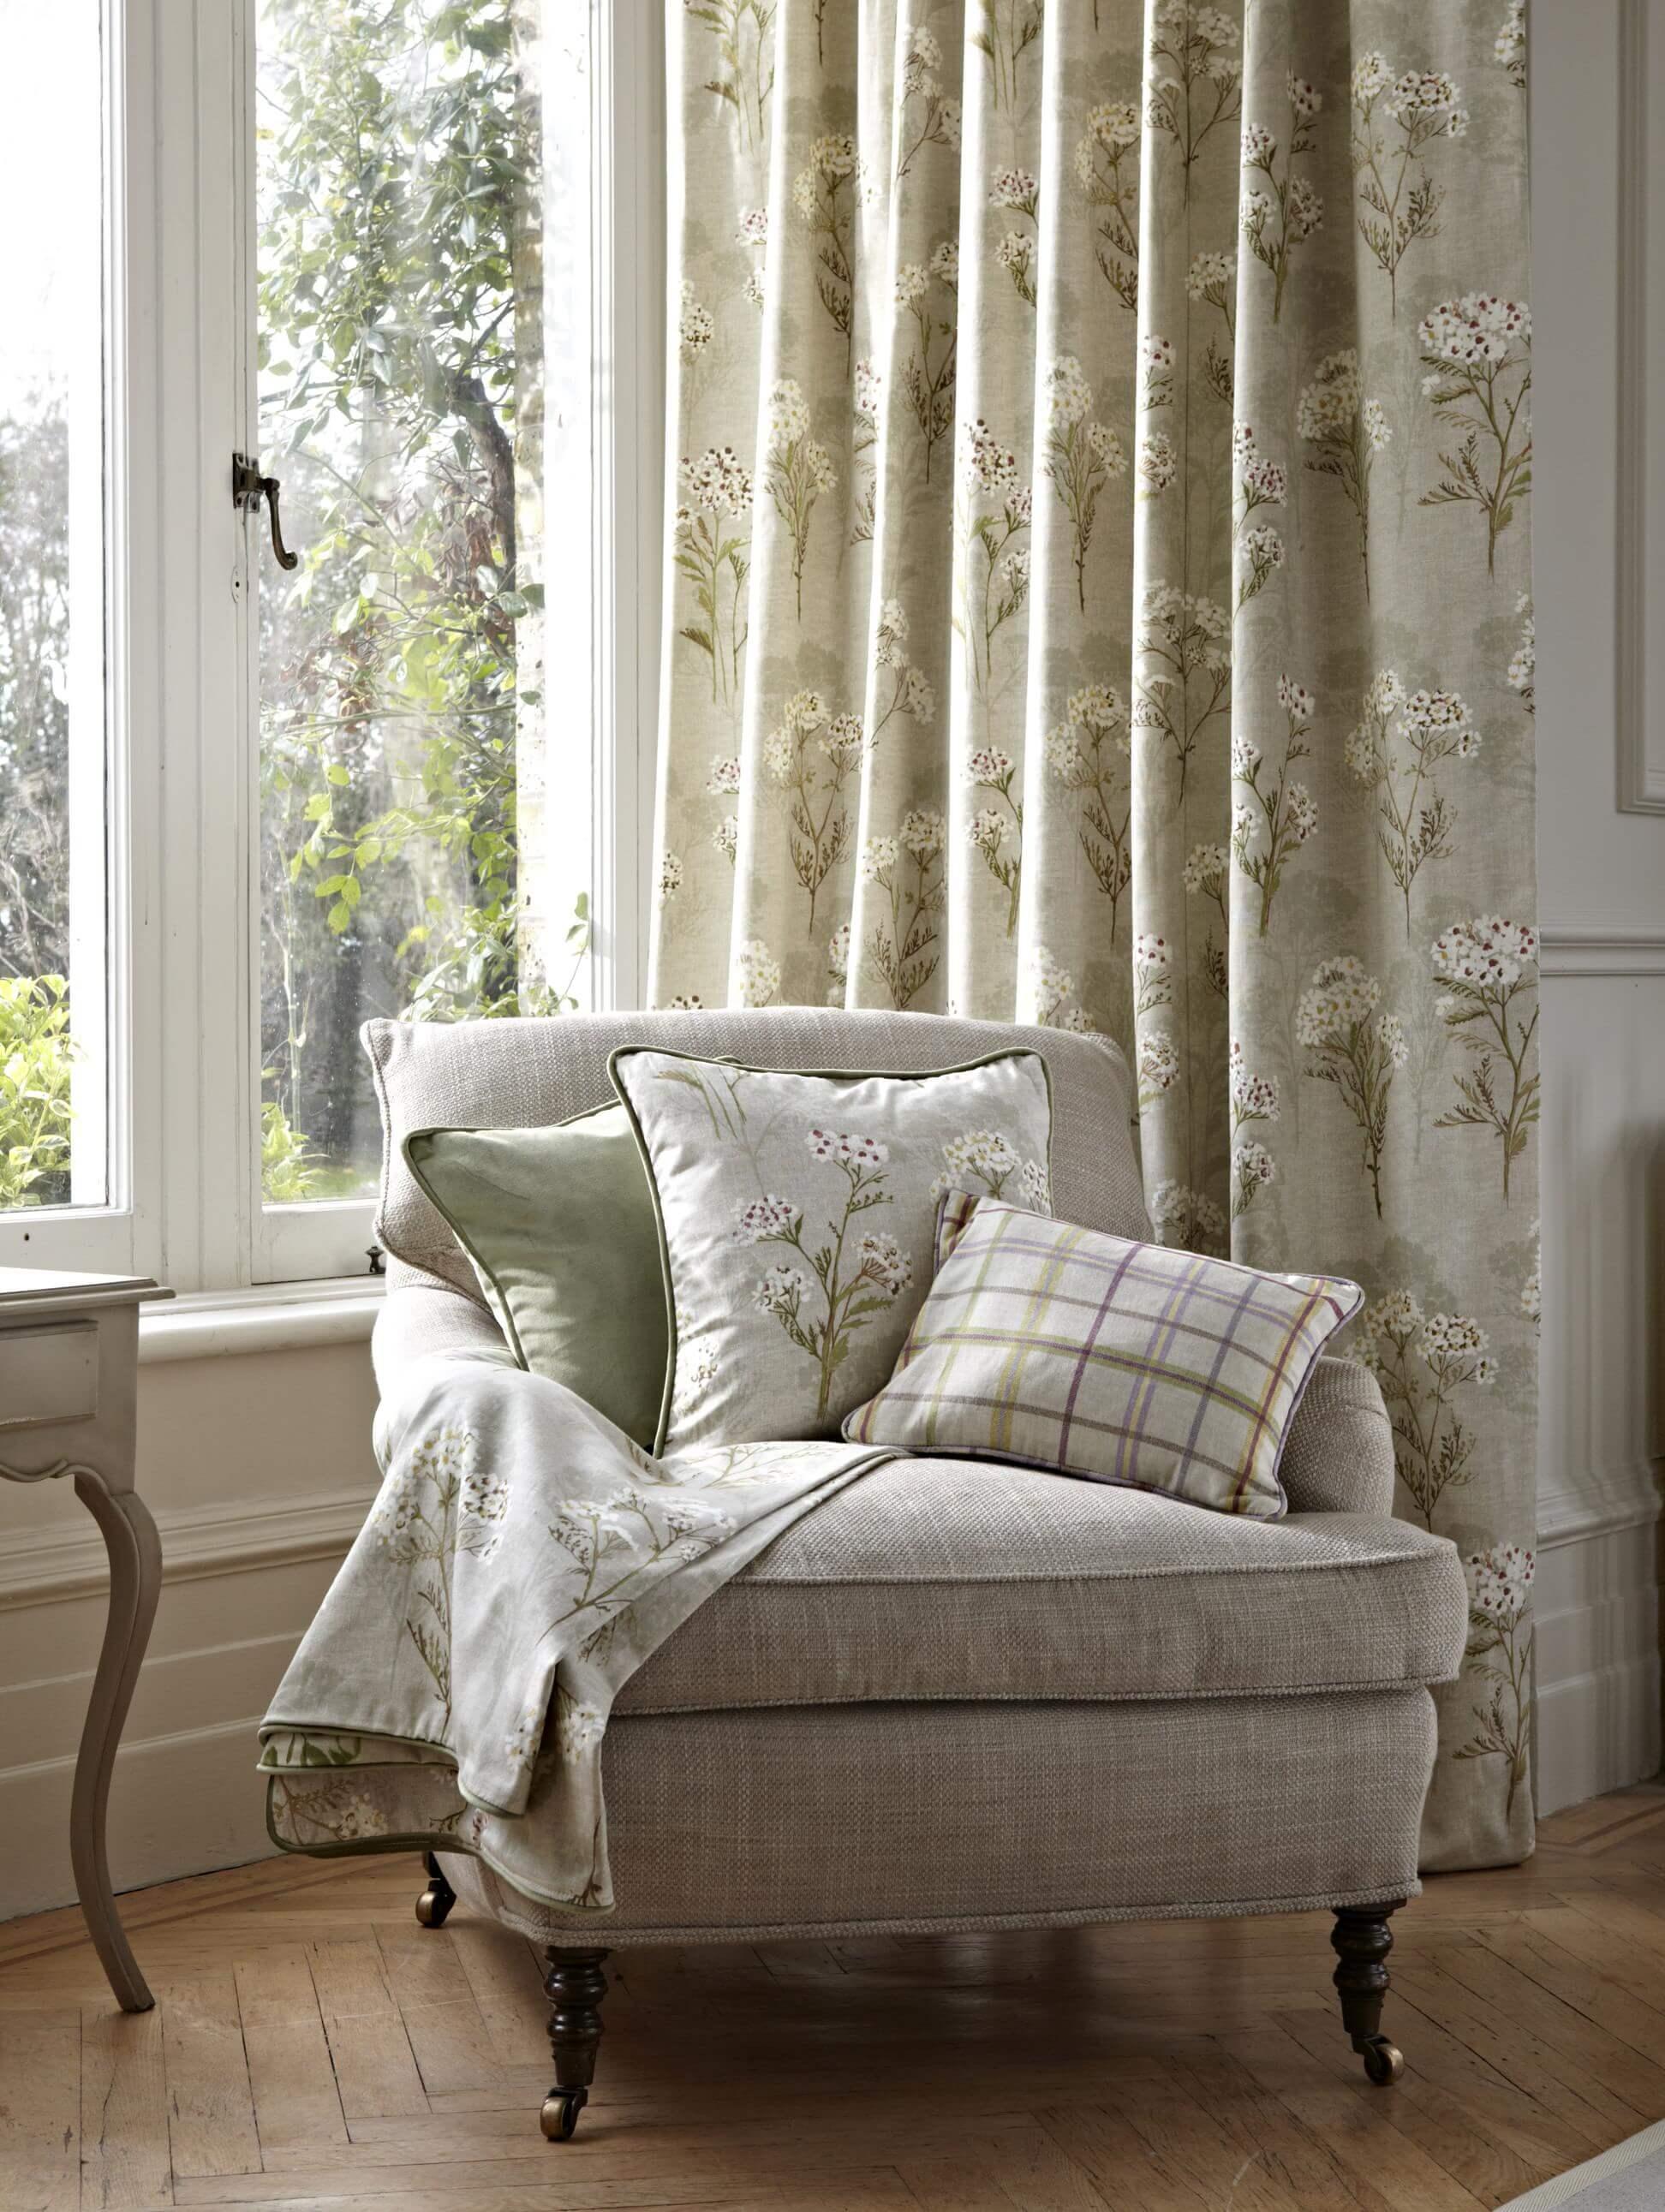 gardinenn herei raumausstattung adler wohndesign. Black Bedroom Furniture Sets. Home Design Ideas